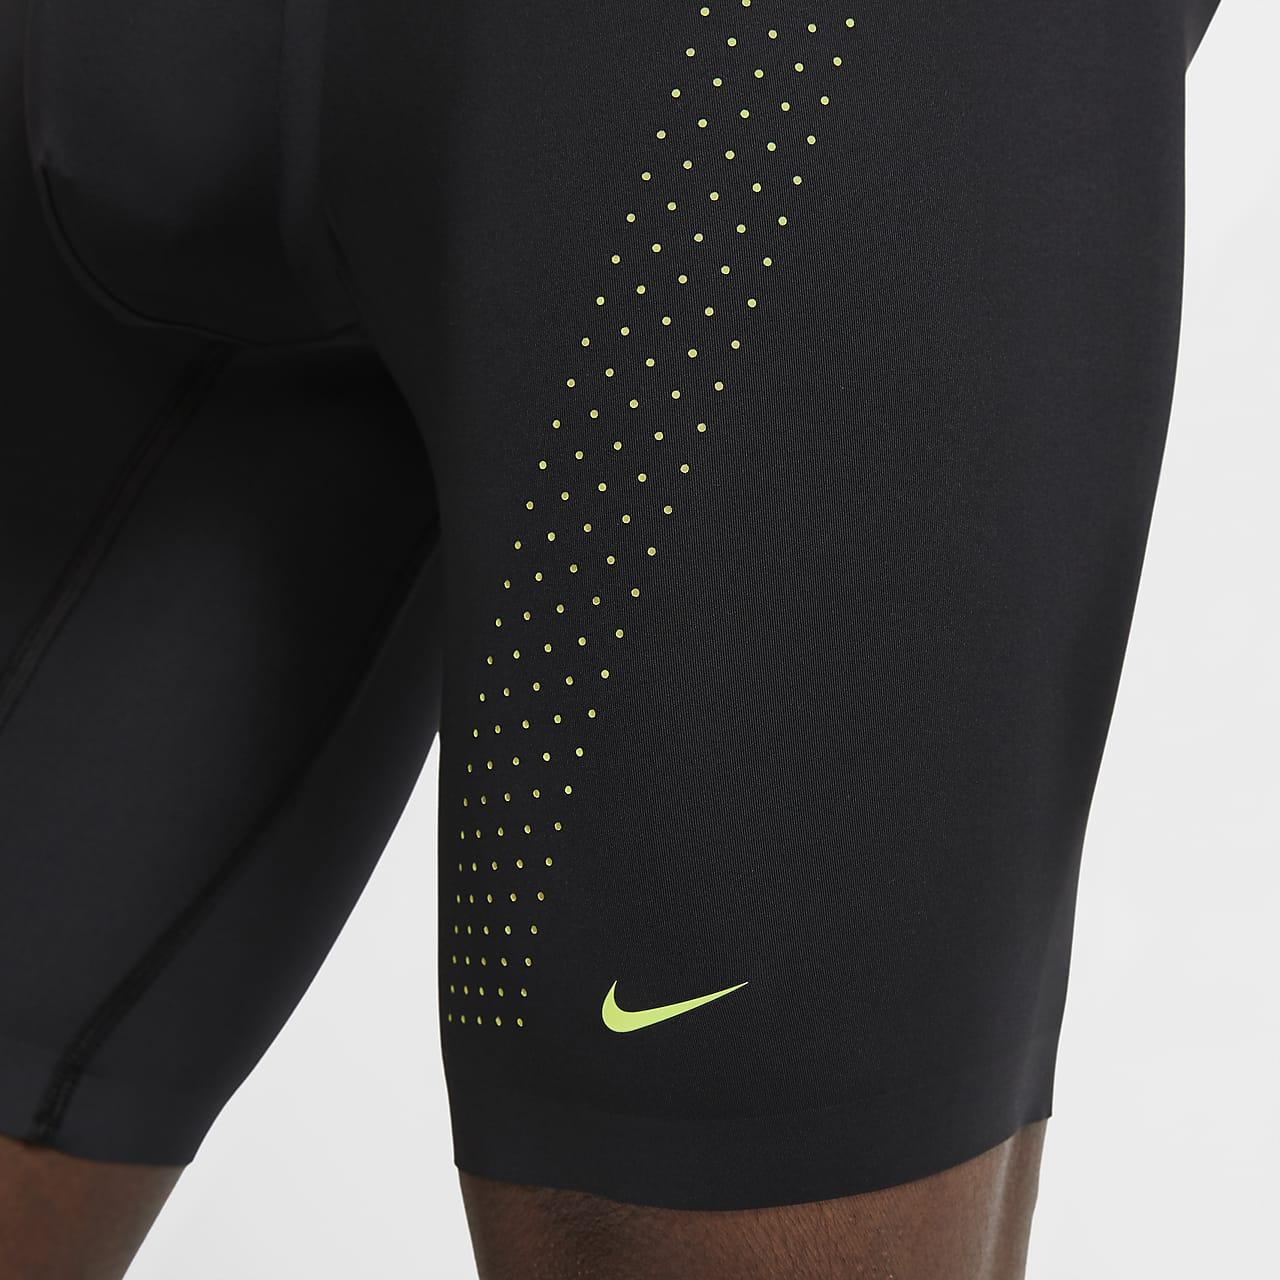 Nike Elite Micro Men's Long Boxer Briefs KE1036-001